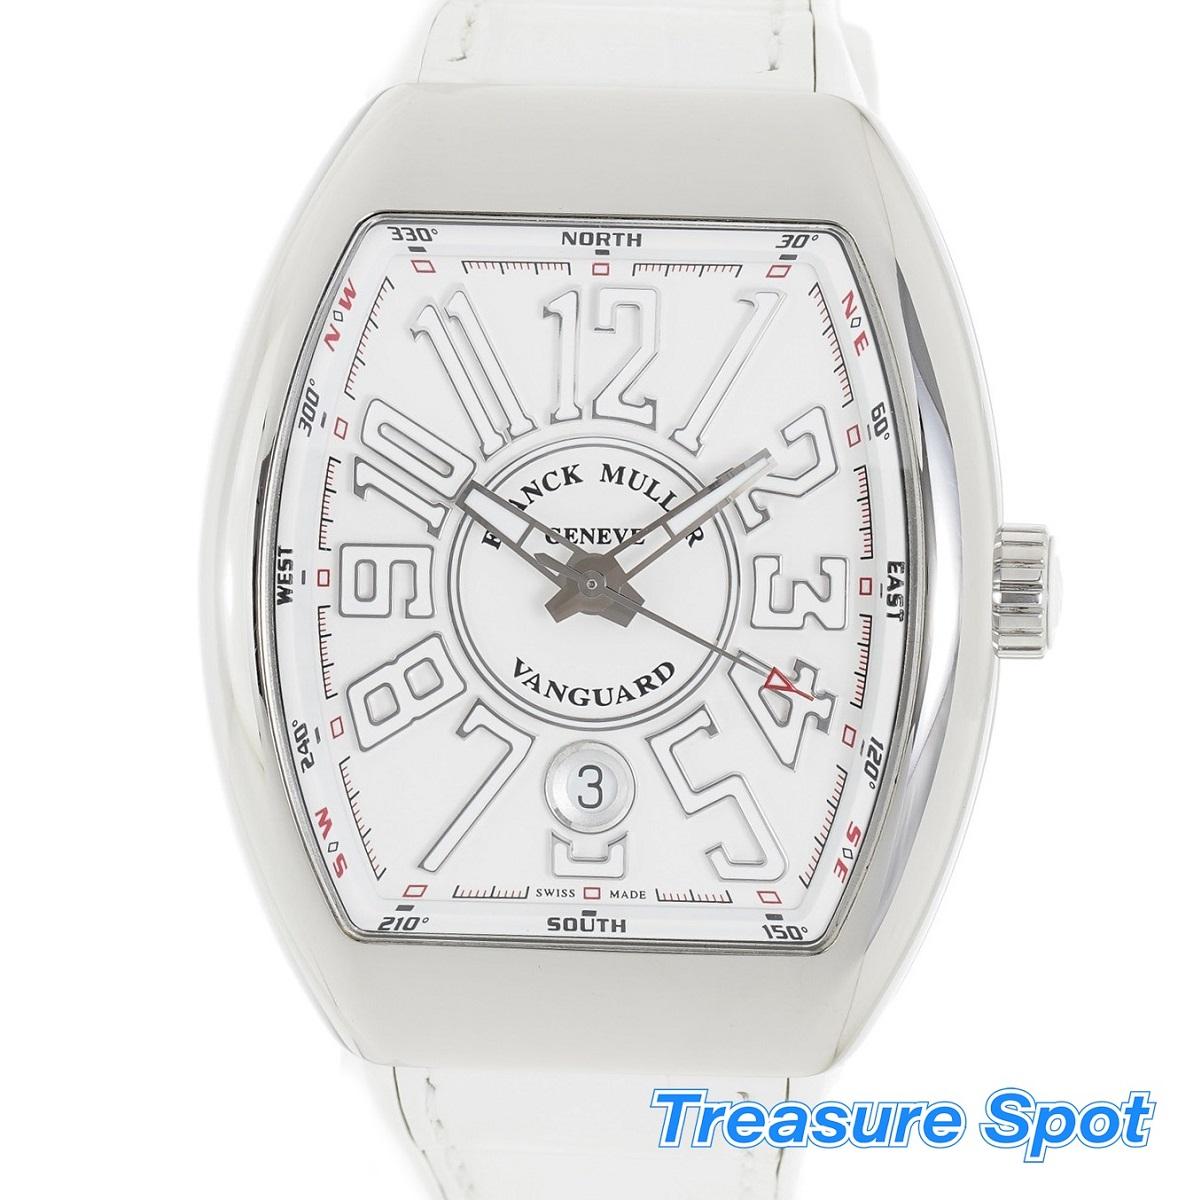 FRANCK MULLER フランクミュラー ヴァンガード V45SCDT 時計 ホワイト 白 SS AT 自動巻き メンズ 腕時計 送料無料 【トレジャースポット】【中古】